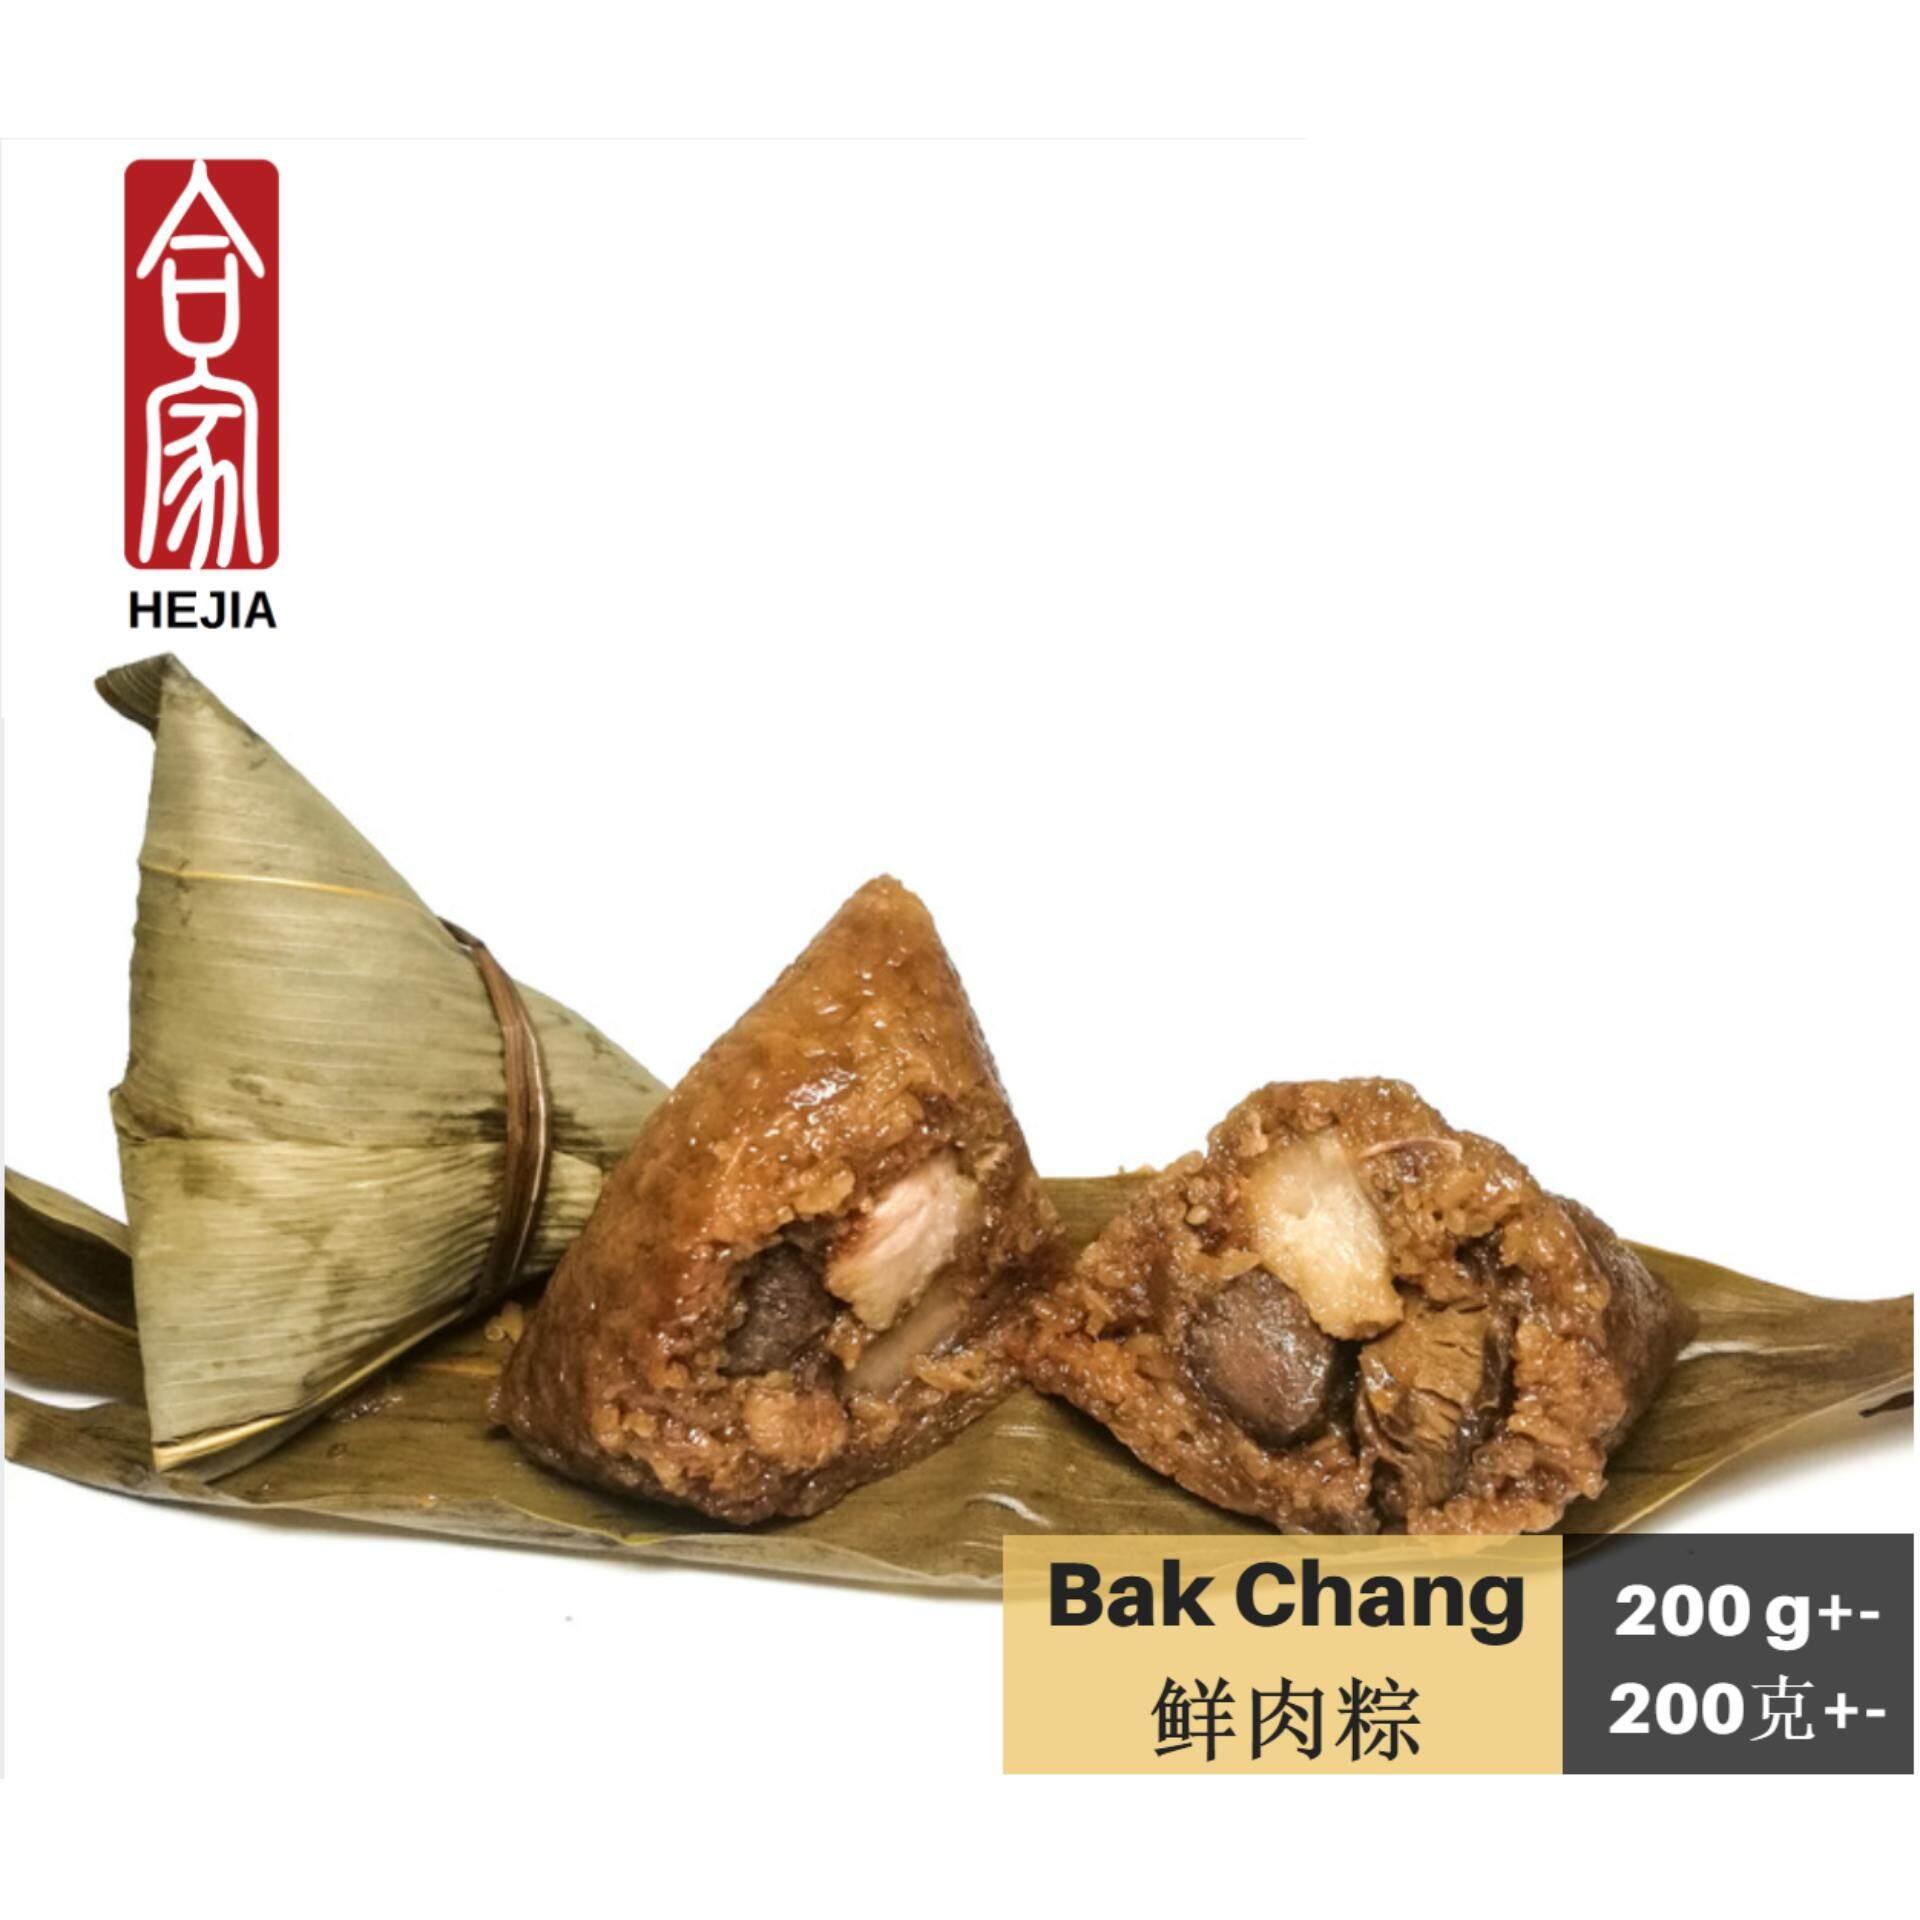 HEJIA Bak Chang Rice Dumpling   [Vacuum Pack] 5PCS